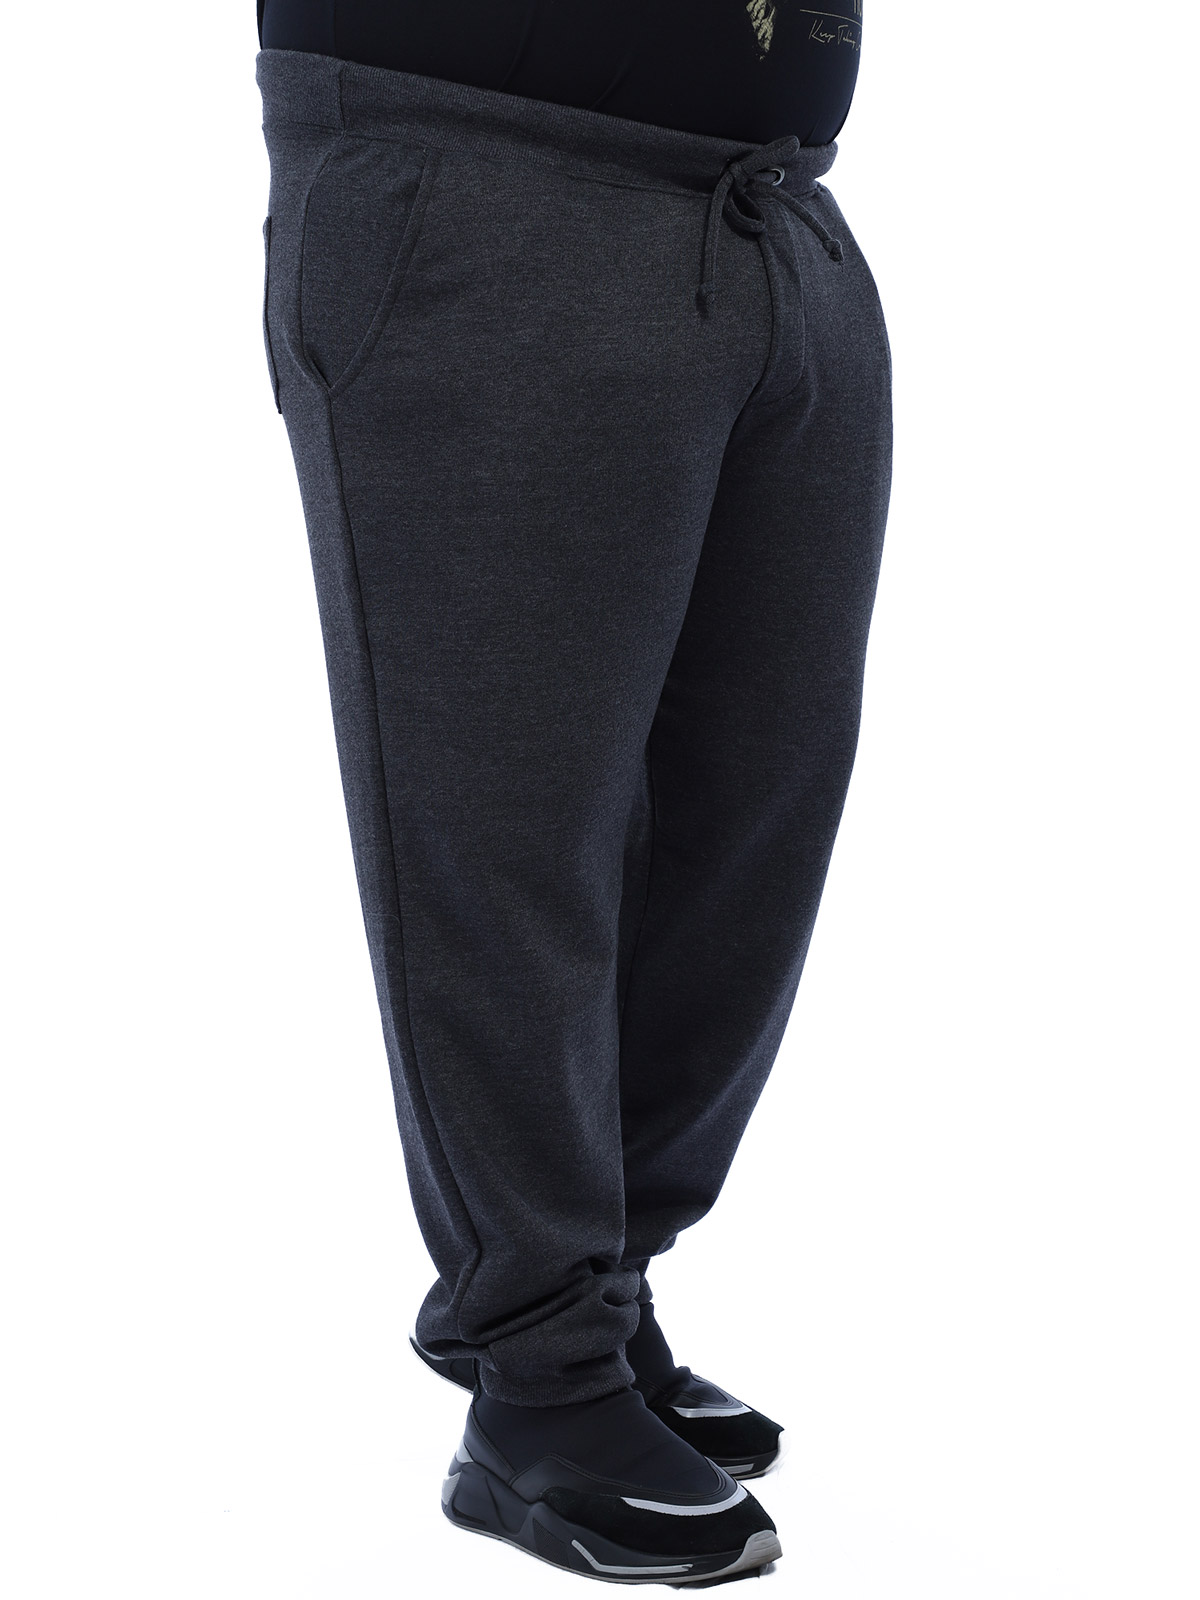 Calça Plus Size Masculino De Moletom Sem Felpa Confort Mescla